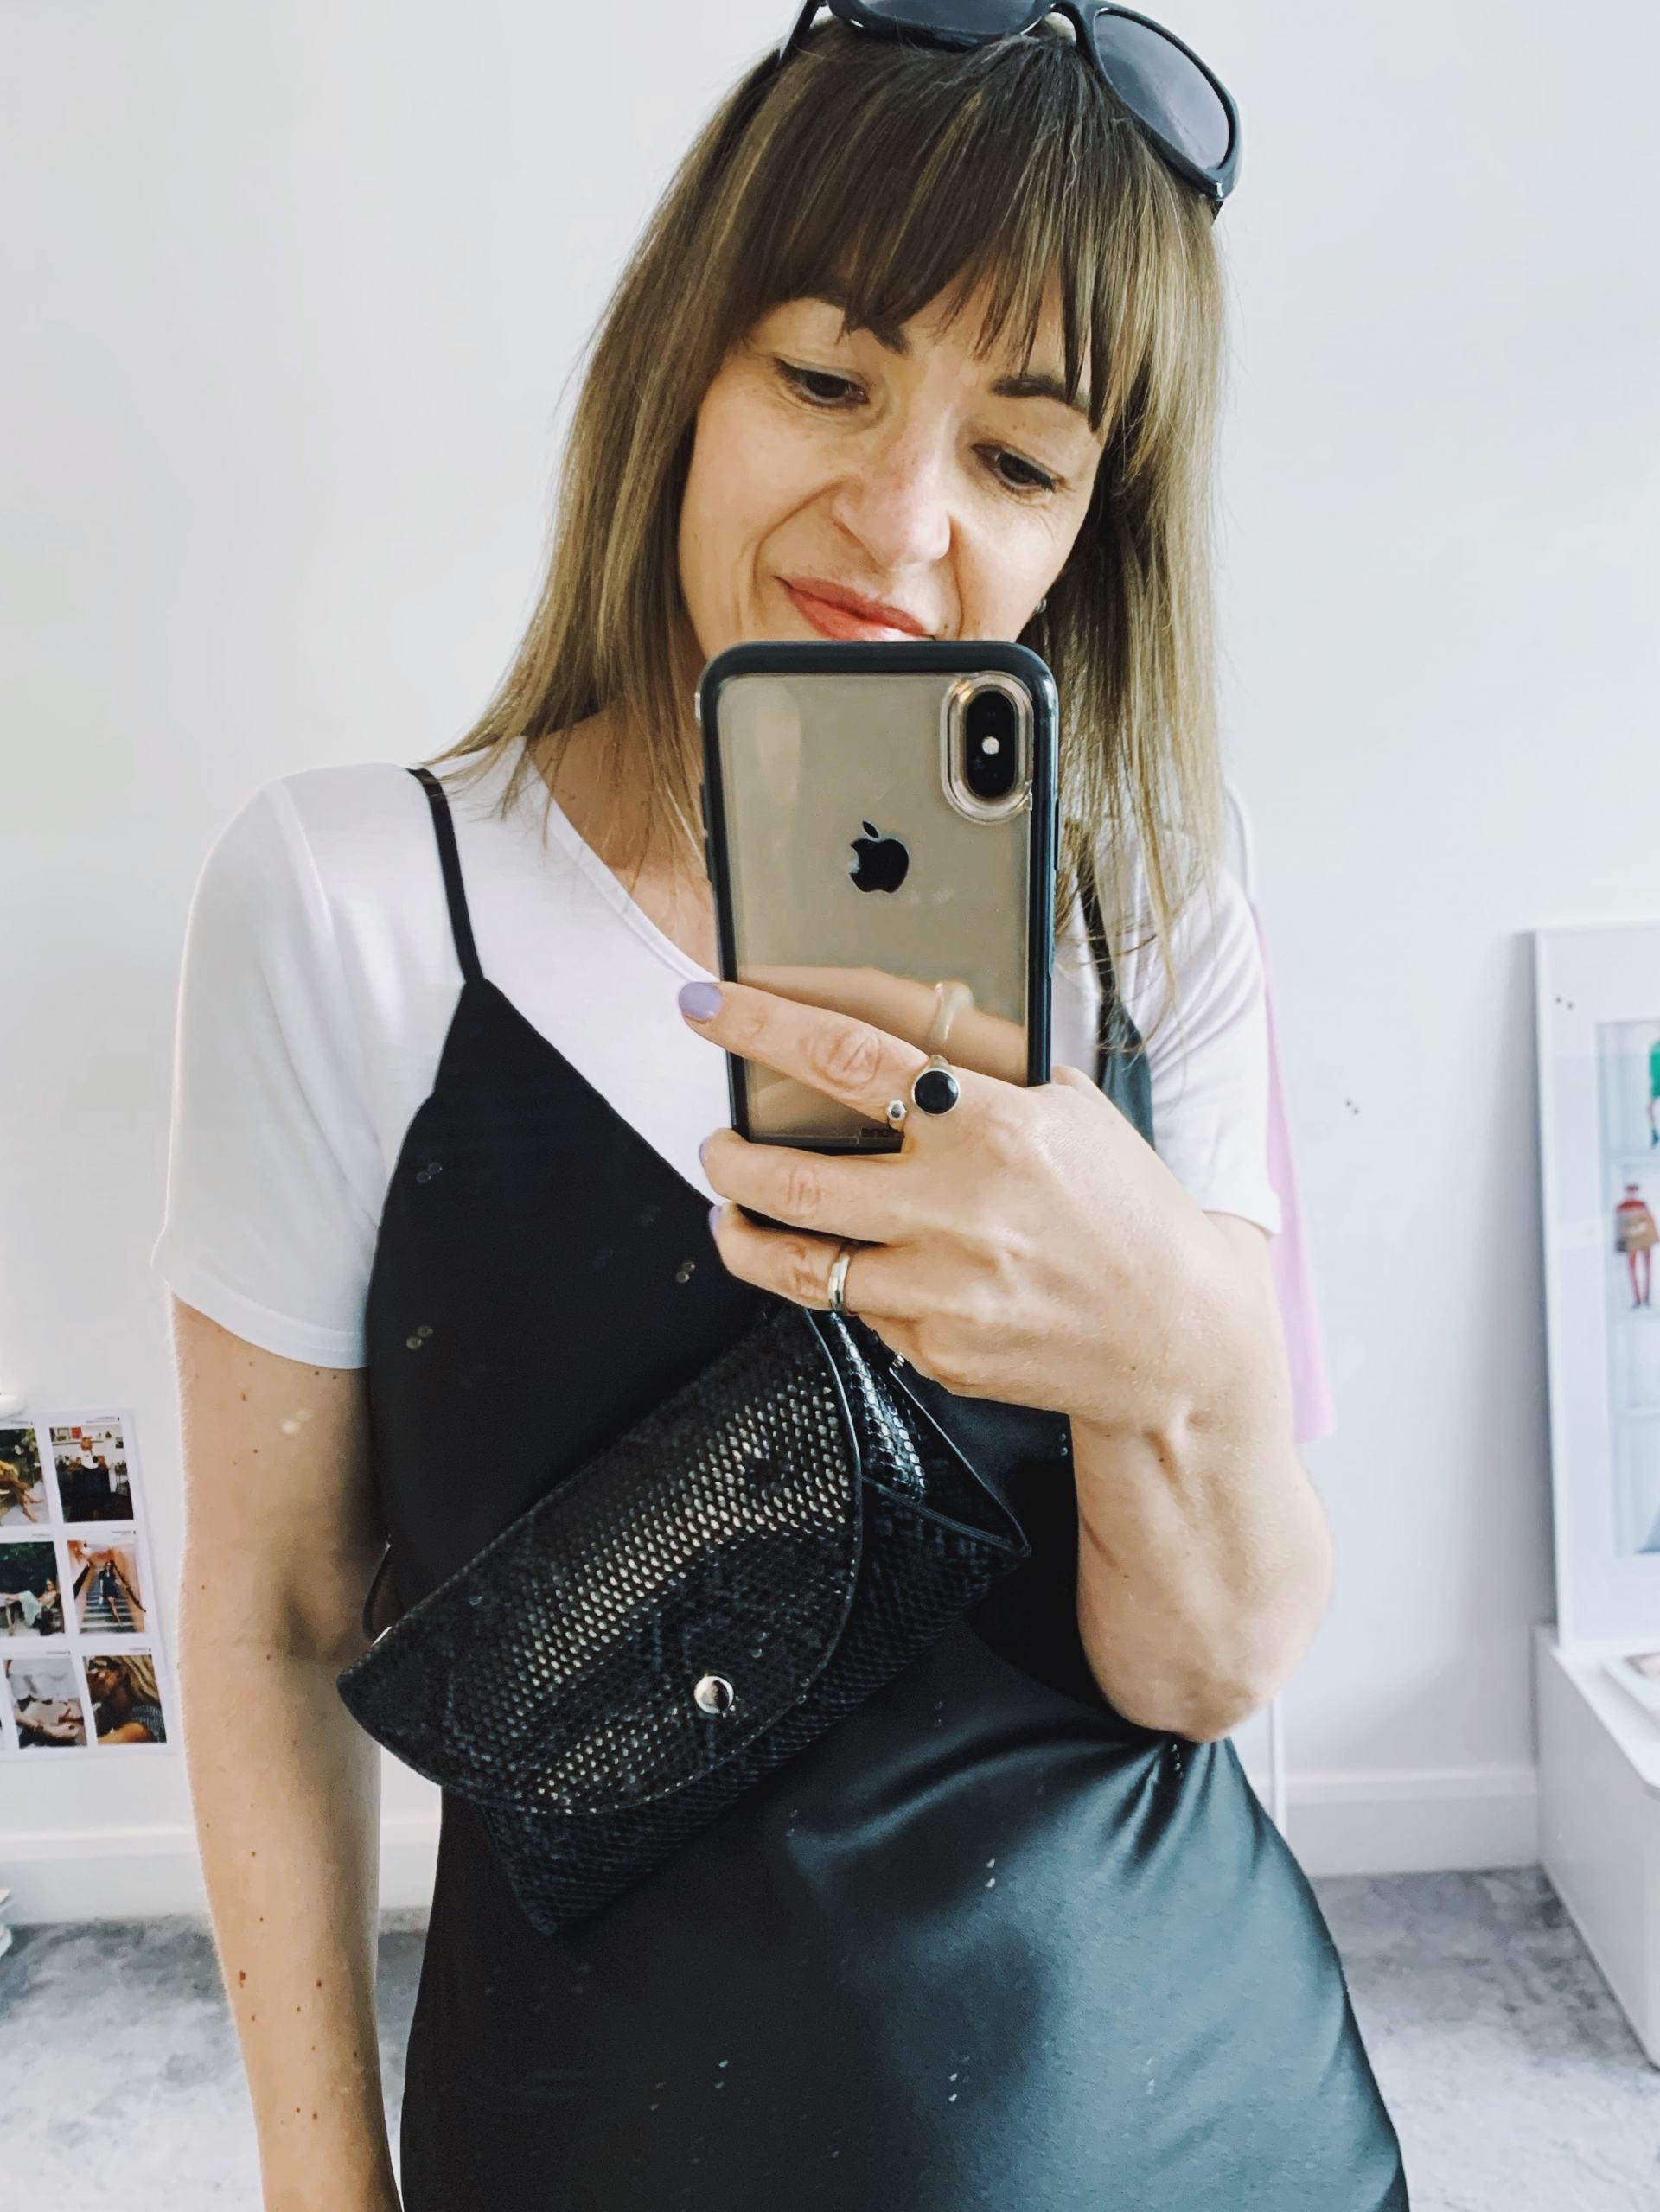 Black satin dress with small black bag